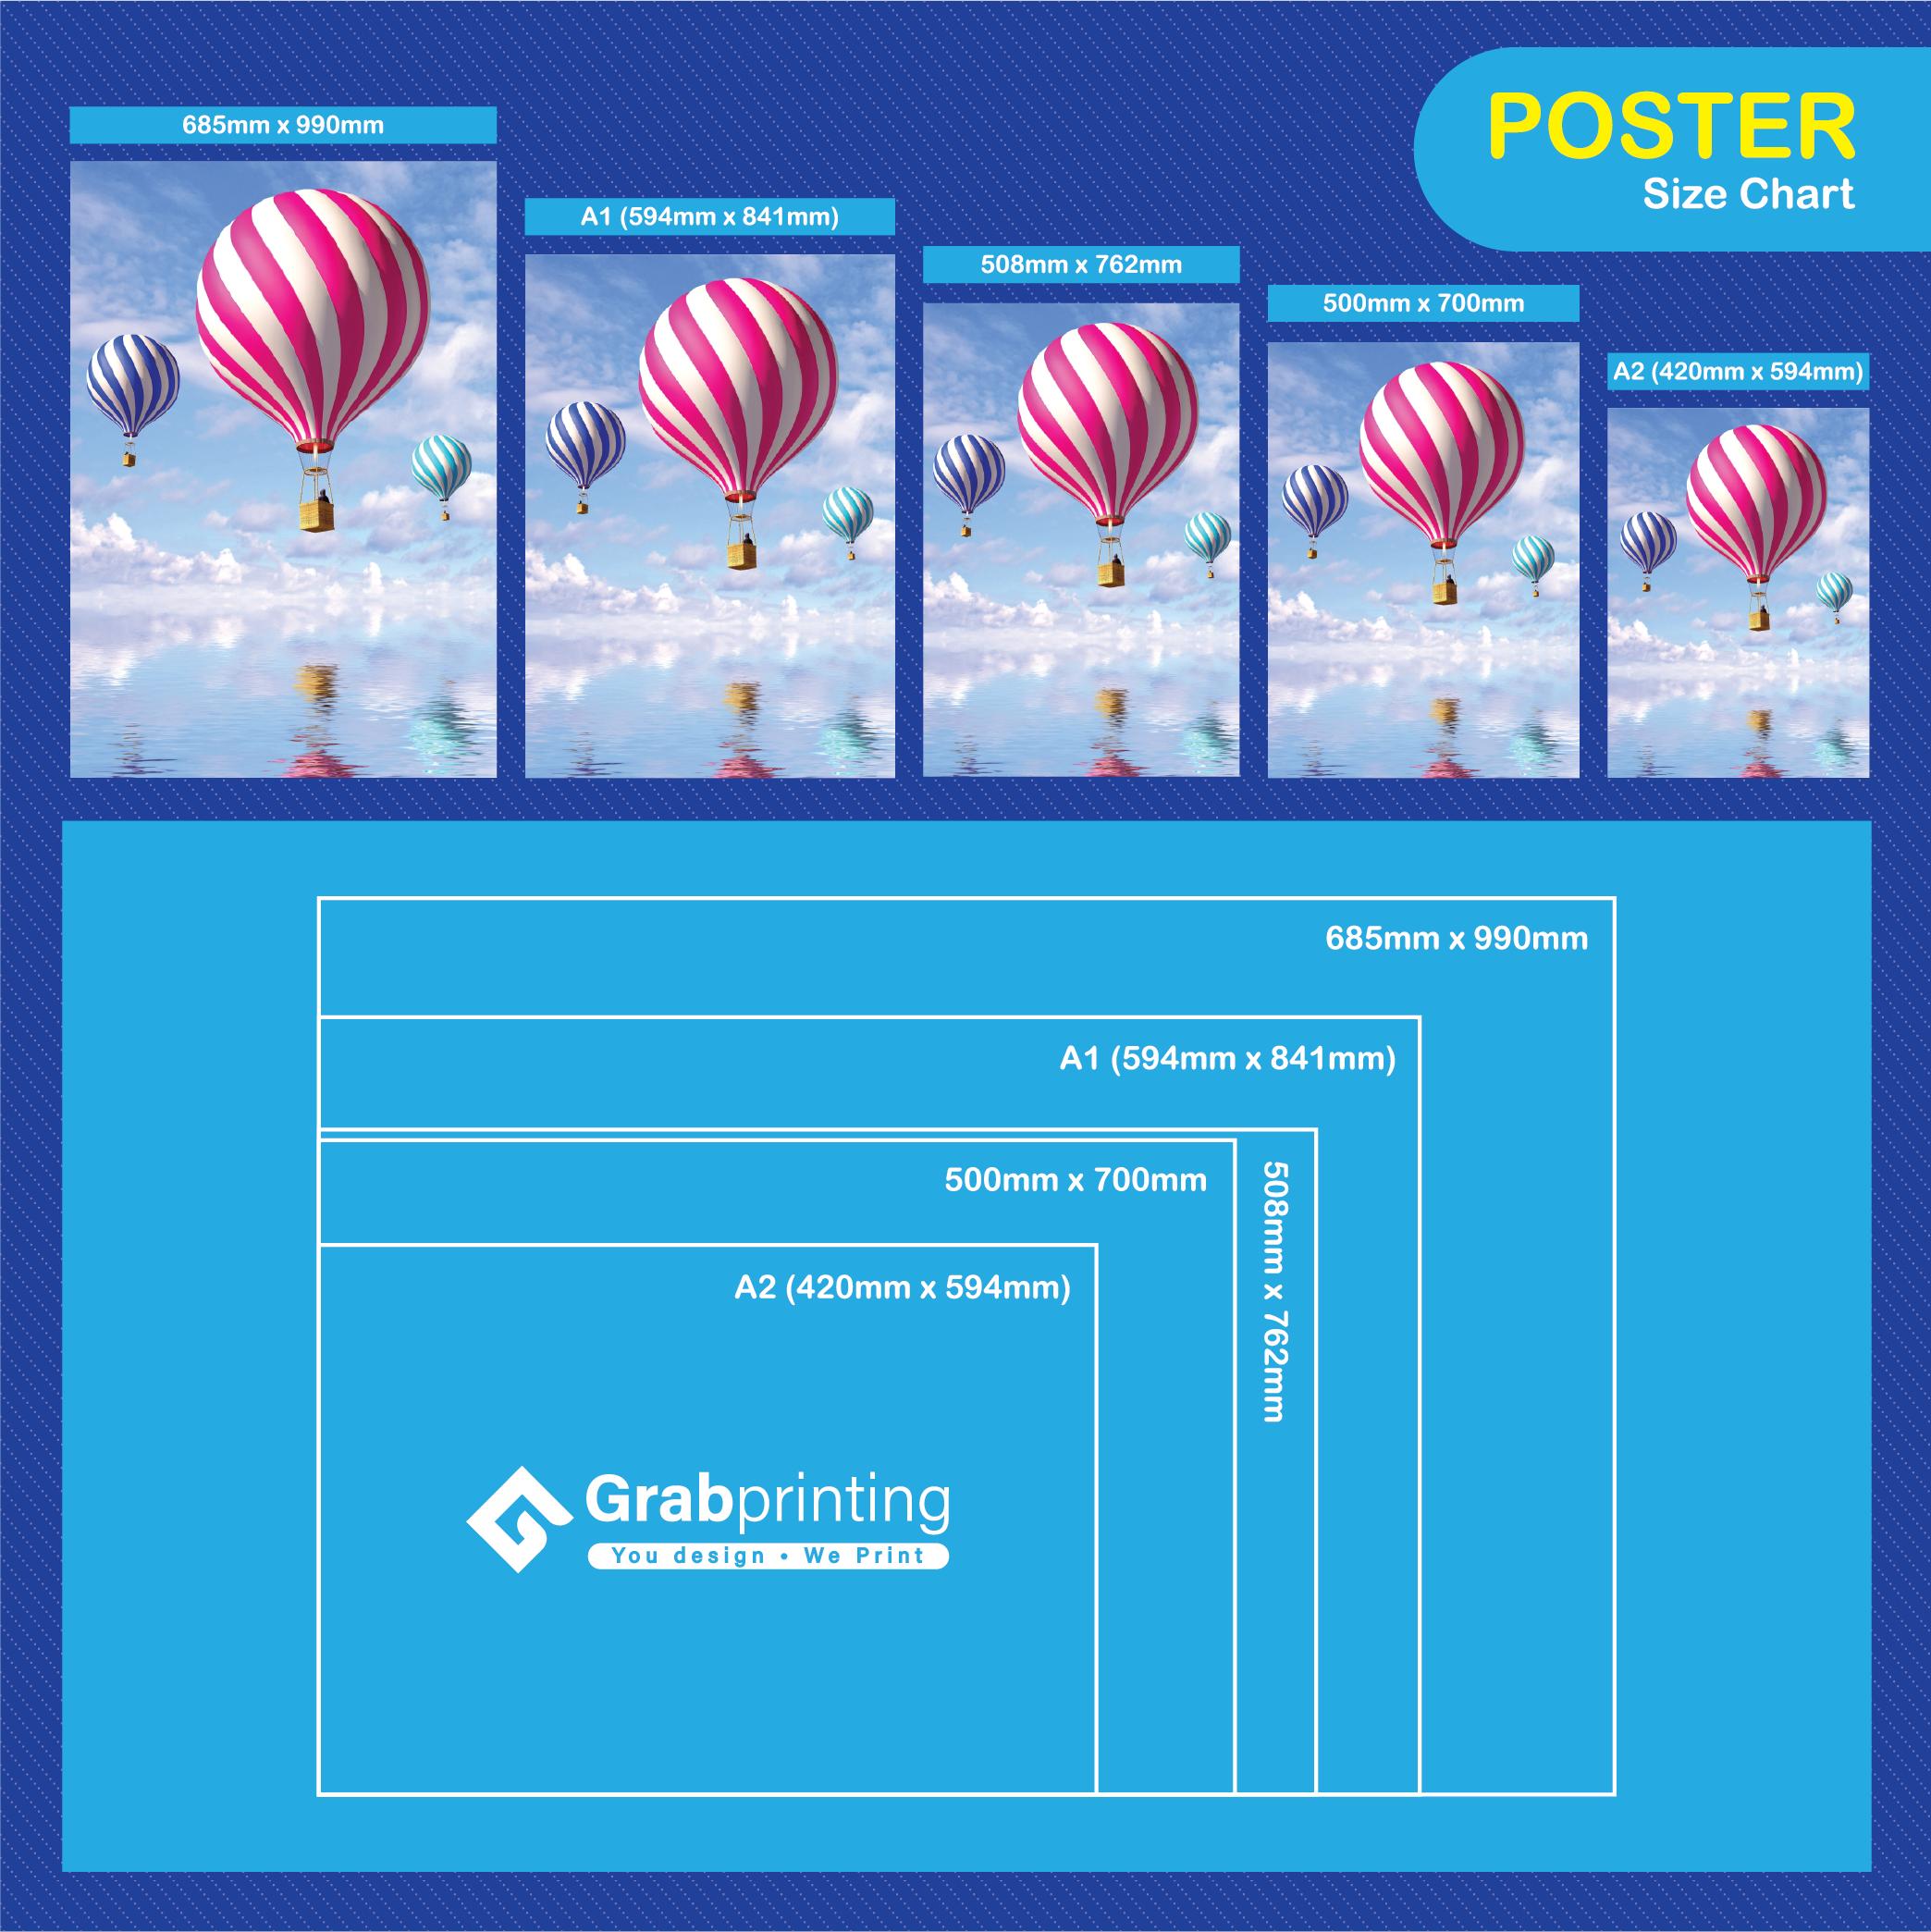 poster printing Poster Poster Printing Size Chart